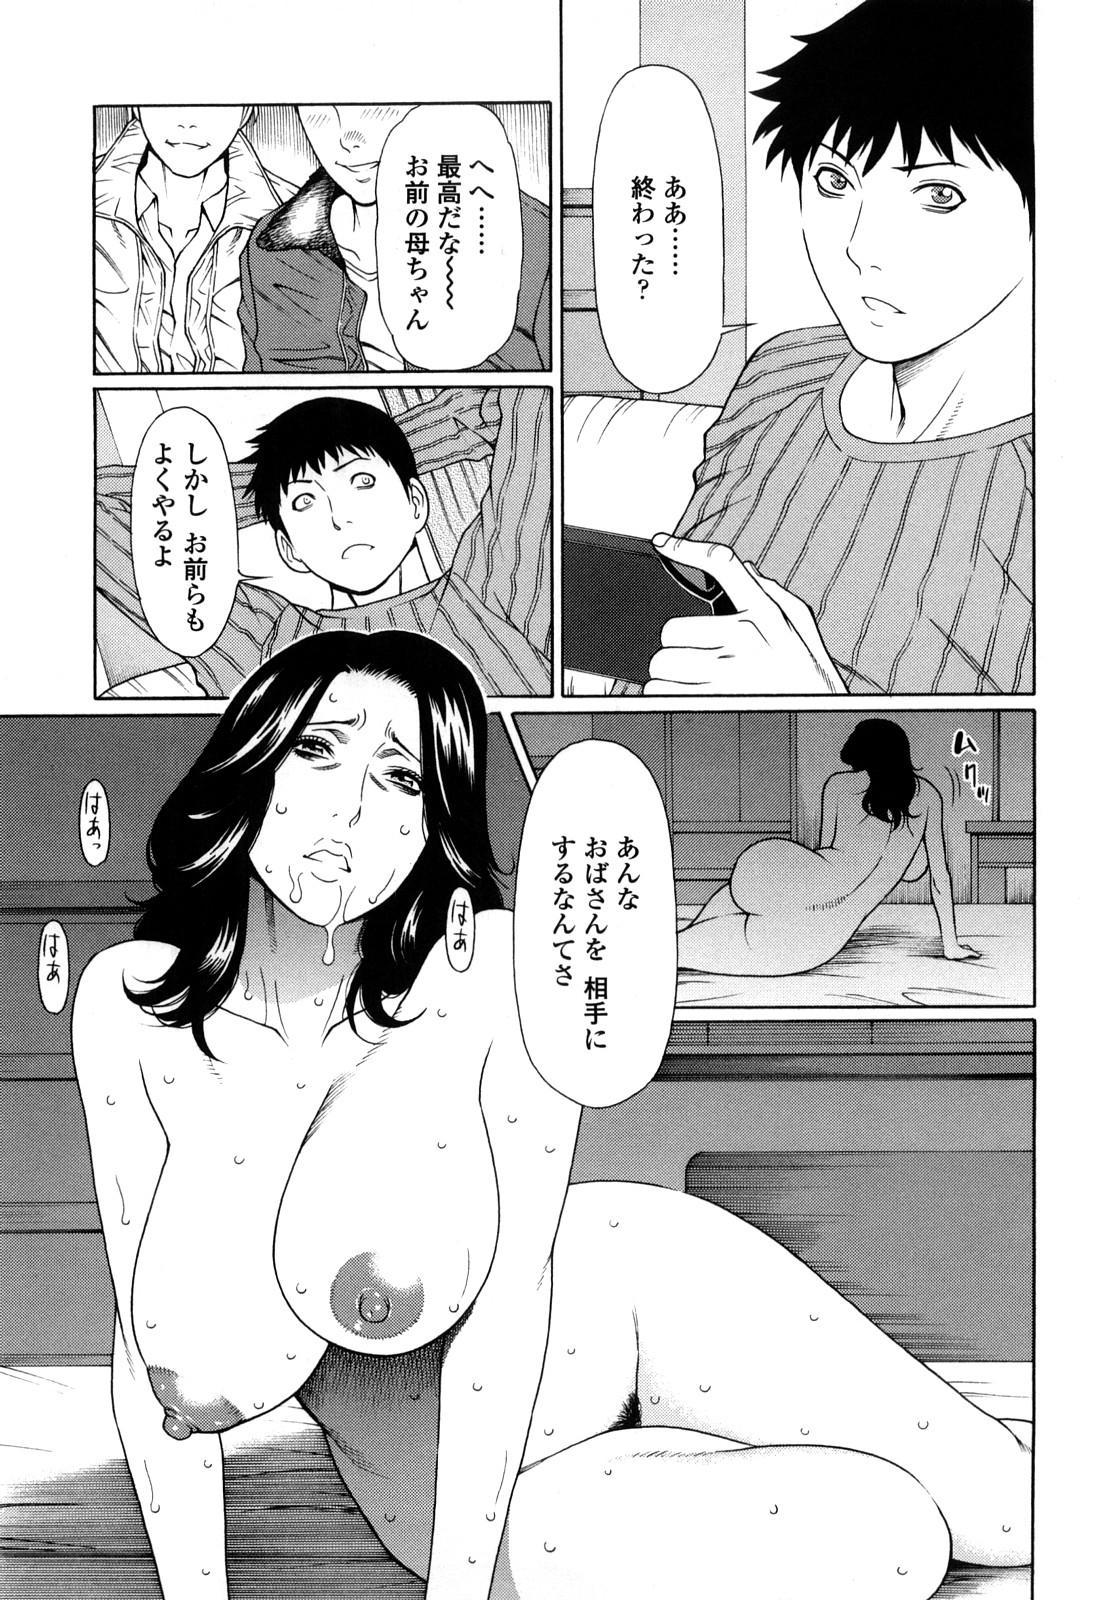 [Takasugi Kou] Kindan no Haha-Ana - Immorality Love-Hole [Decensored] 6